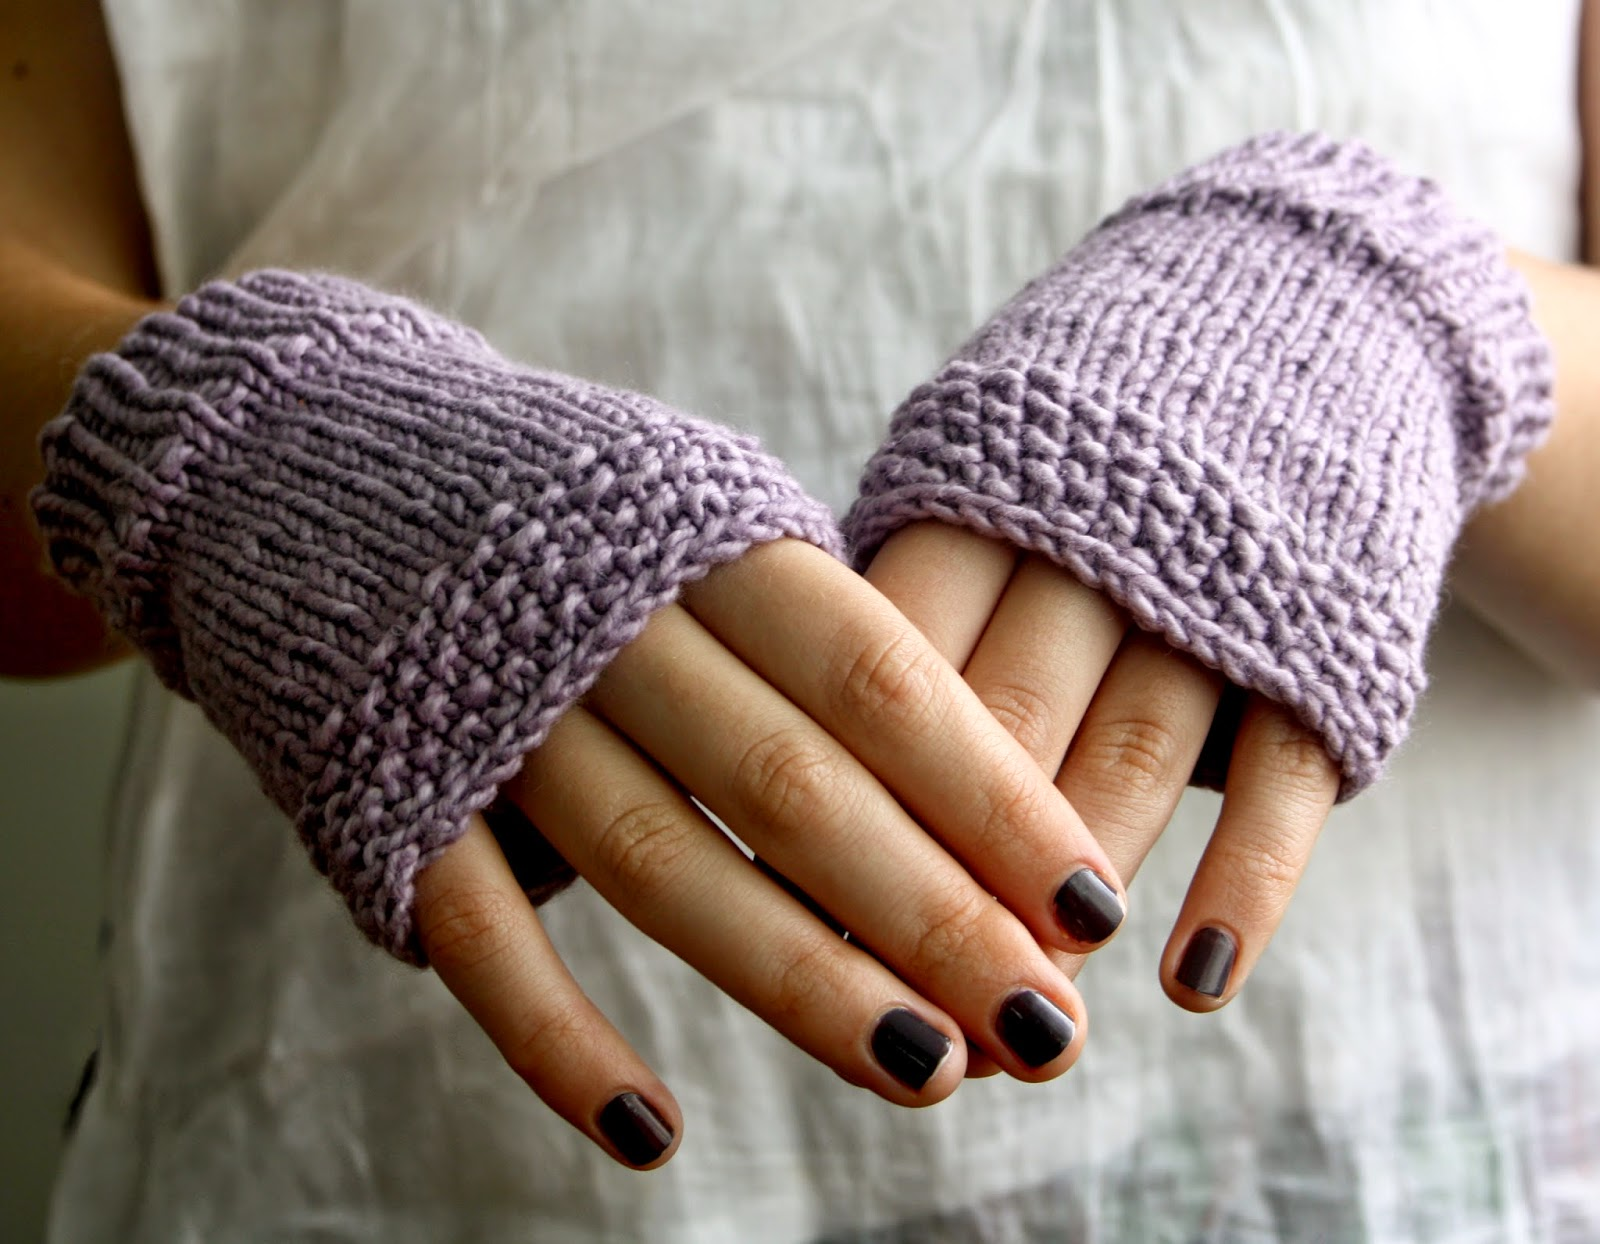 https://www.etsy.com/au/listing/184363231/organic-cotton-fingerless-gloves-handkit?ref=shop_home_active_6